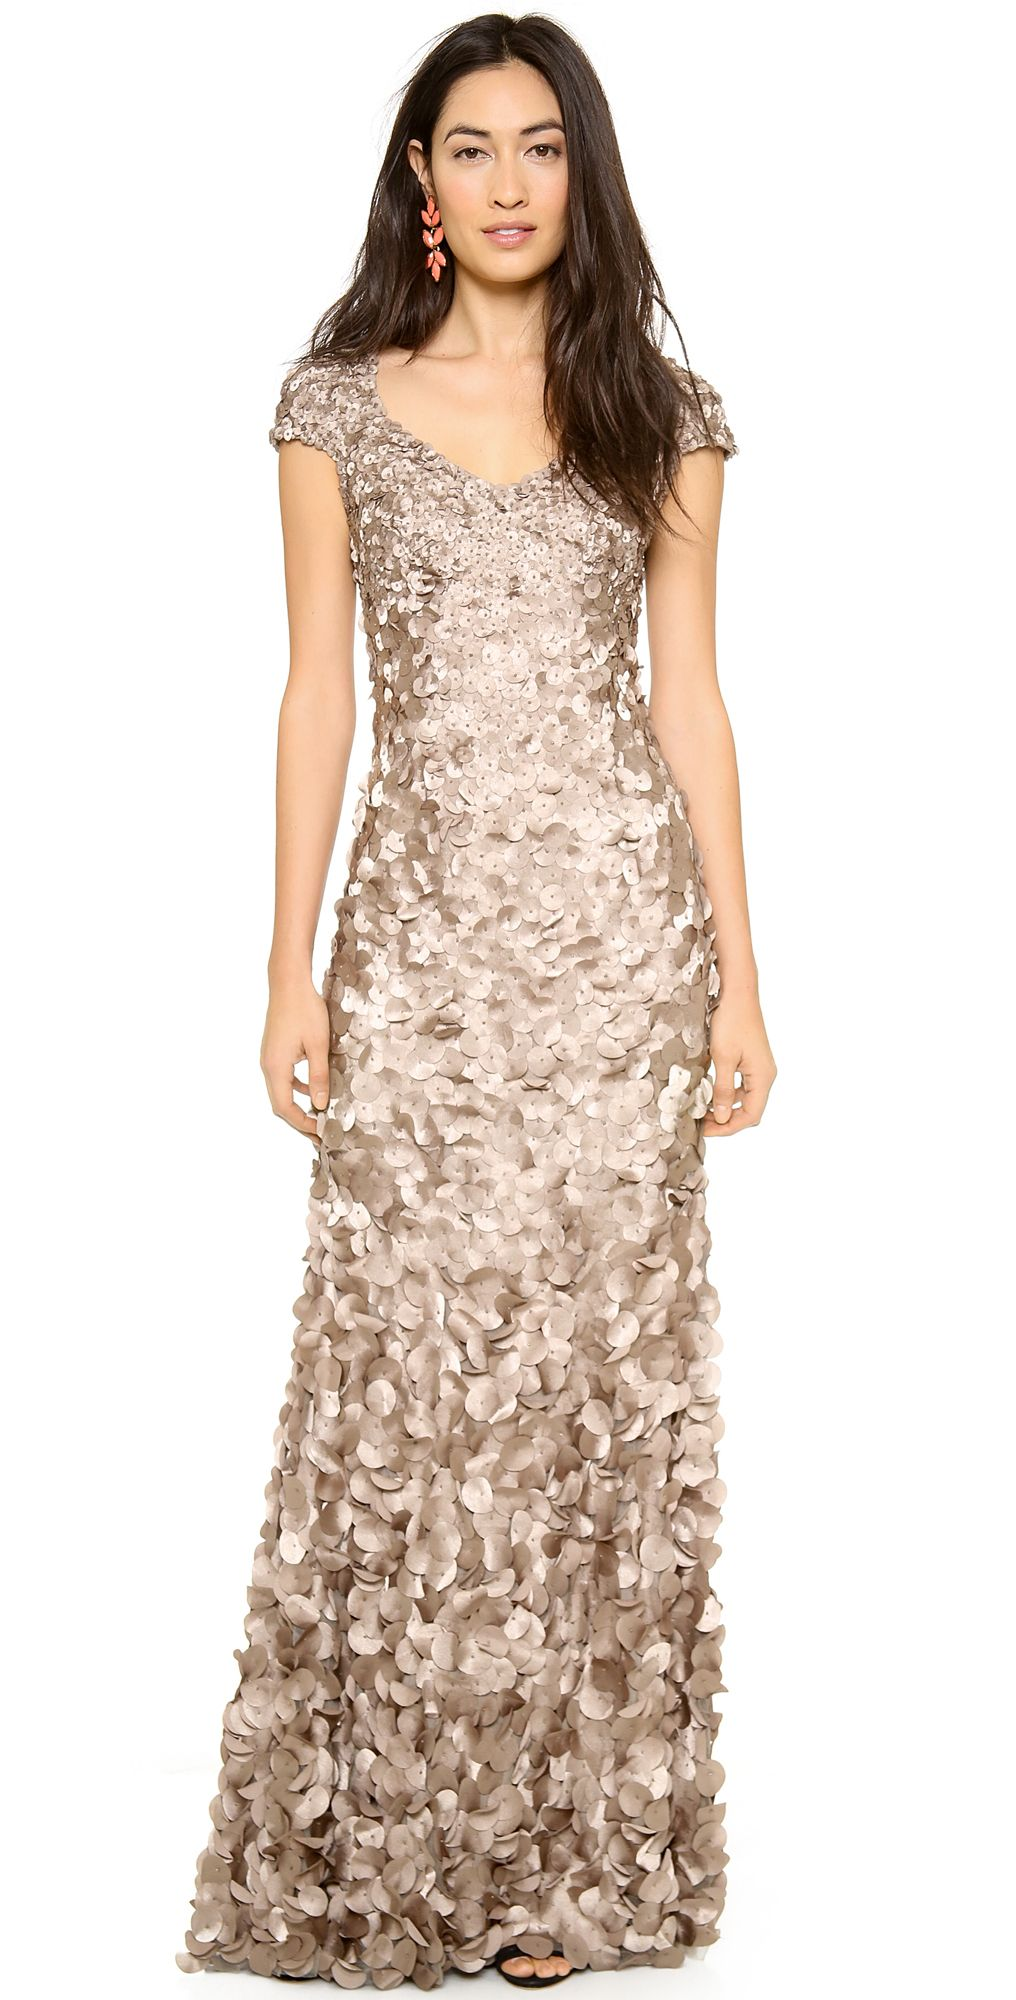 Petal Cap Sleeve Gown | Dresses | Pinterest | Gowns, Cap sleeve gown ...